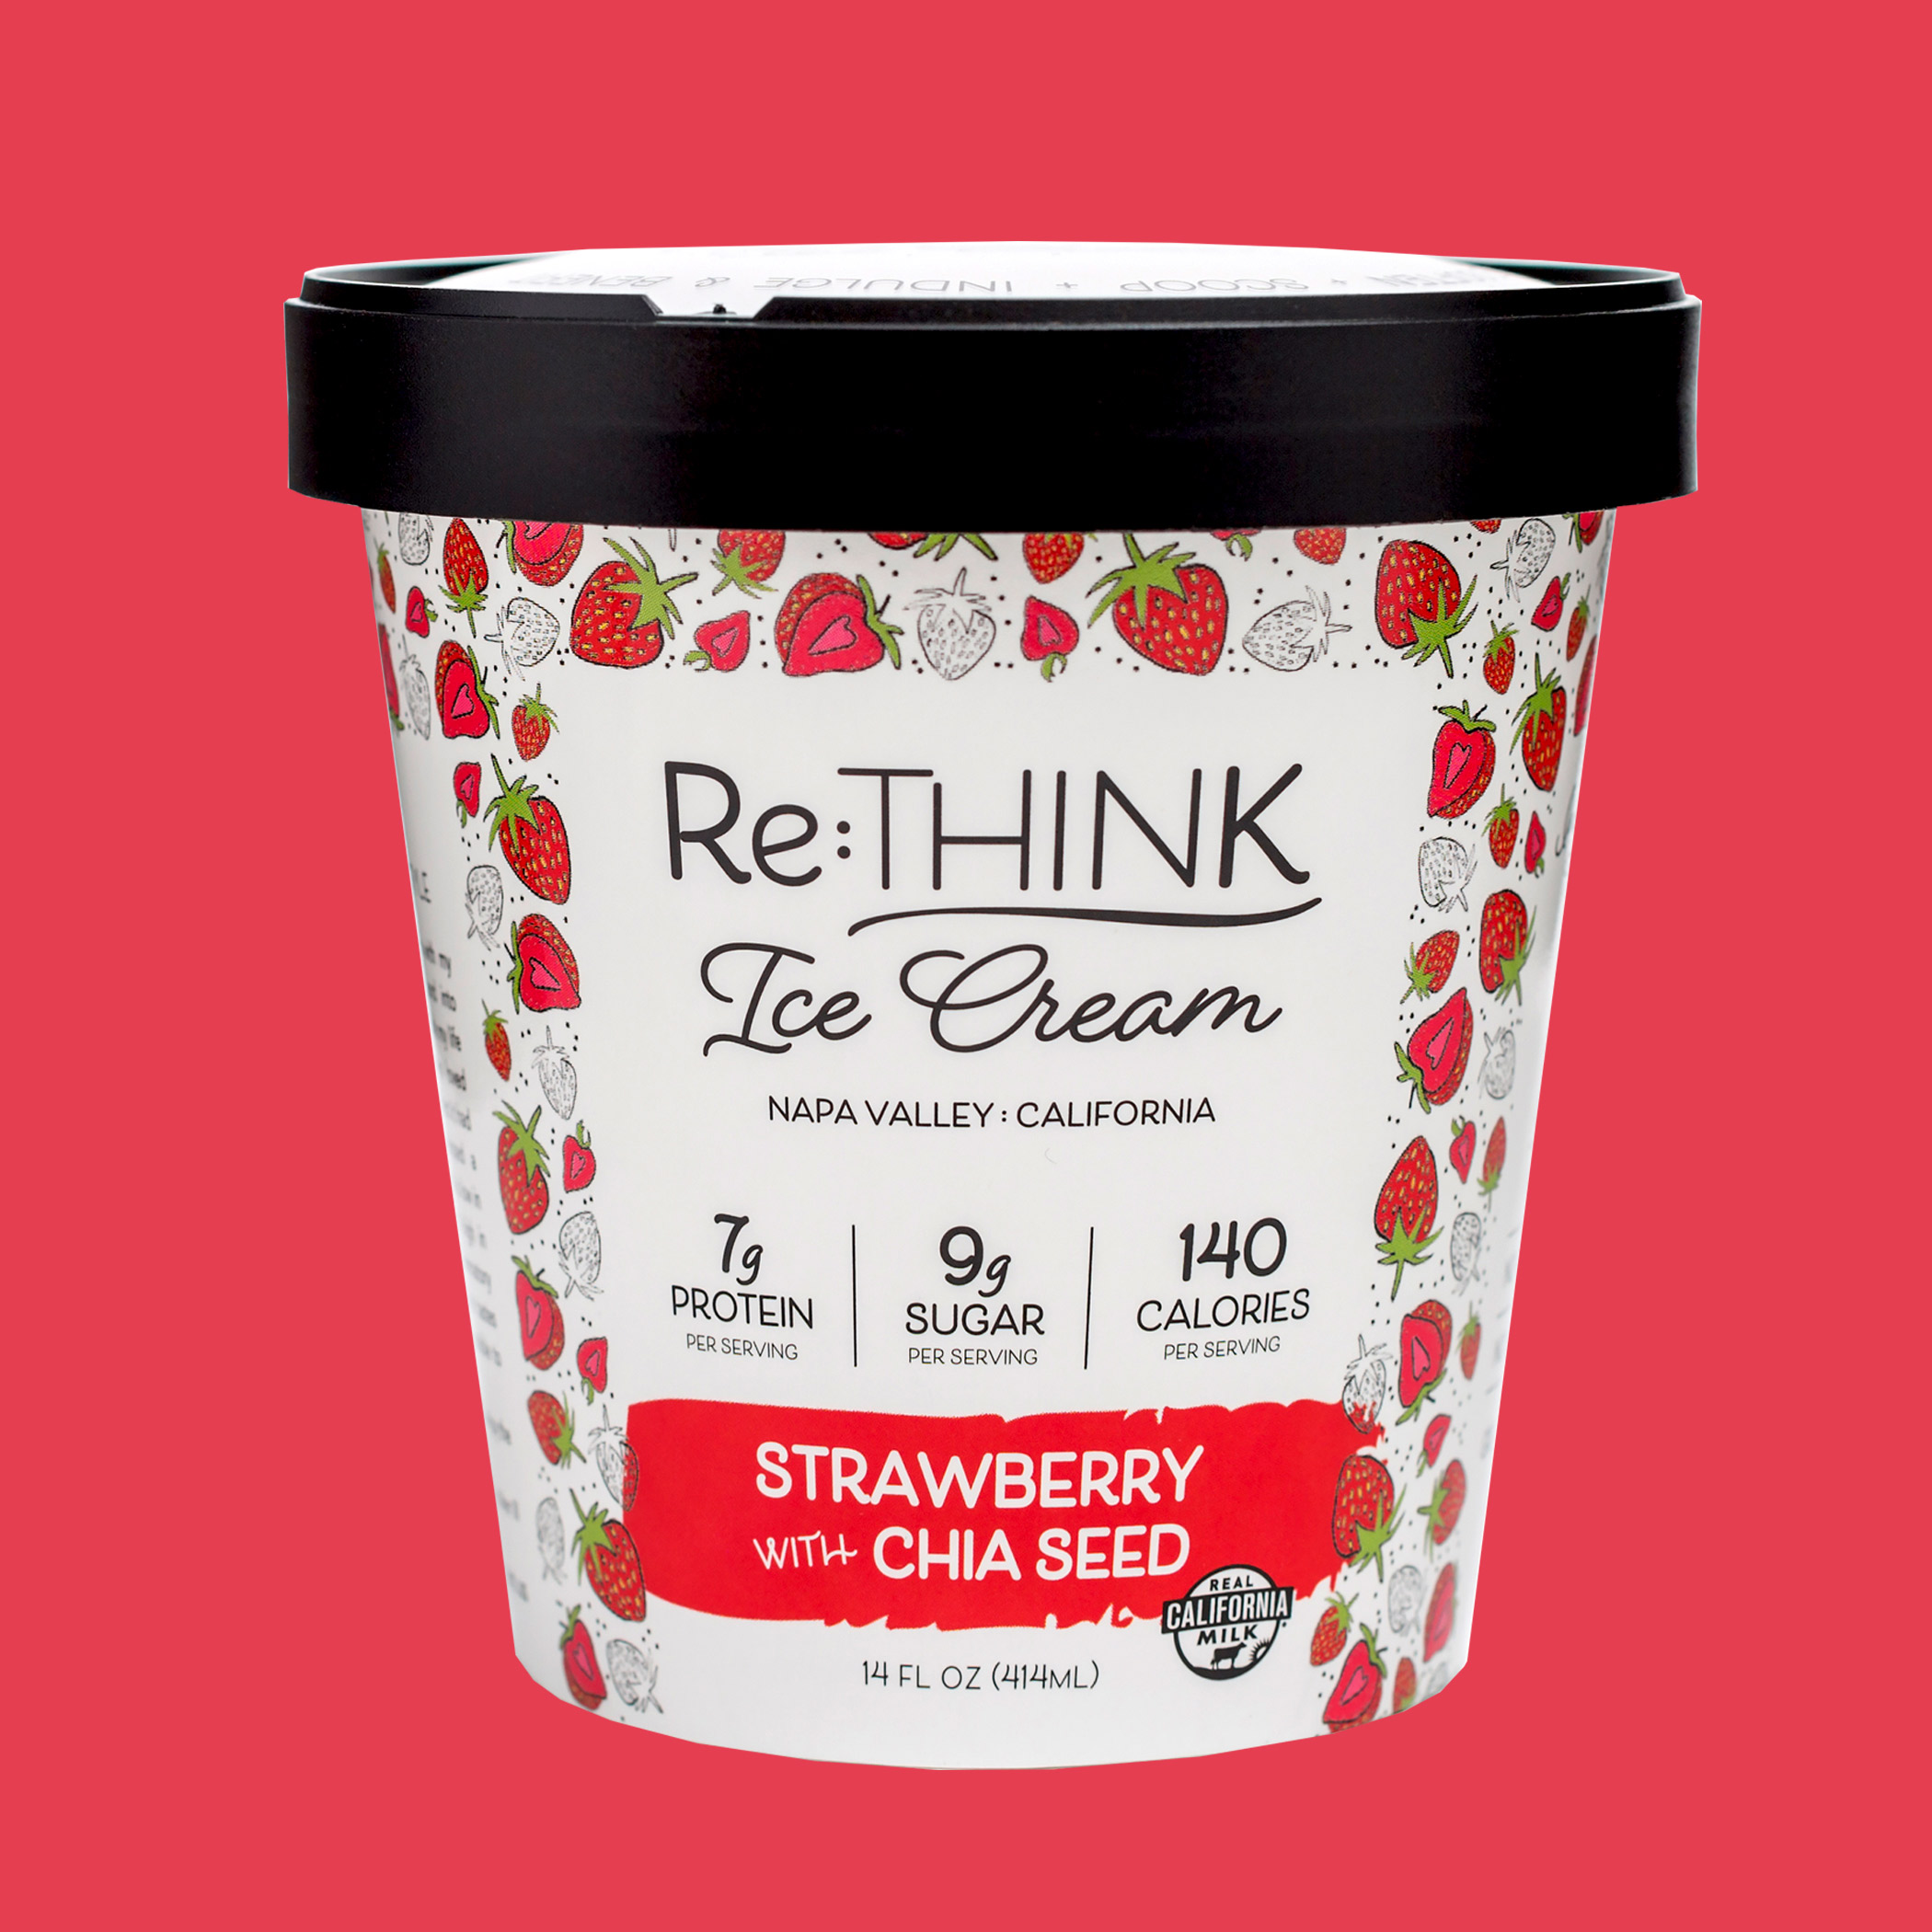 Strawberry Chia Seed - Sweet, juicy strawberry ice cream swirls around fiber-rich chia seeds creating a healthier twist on a classic favorite.